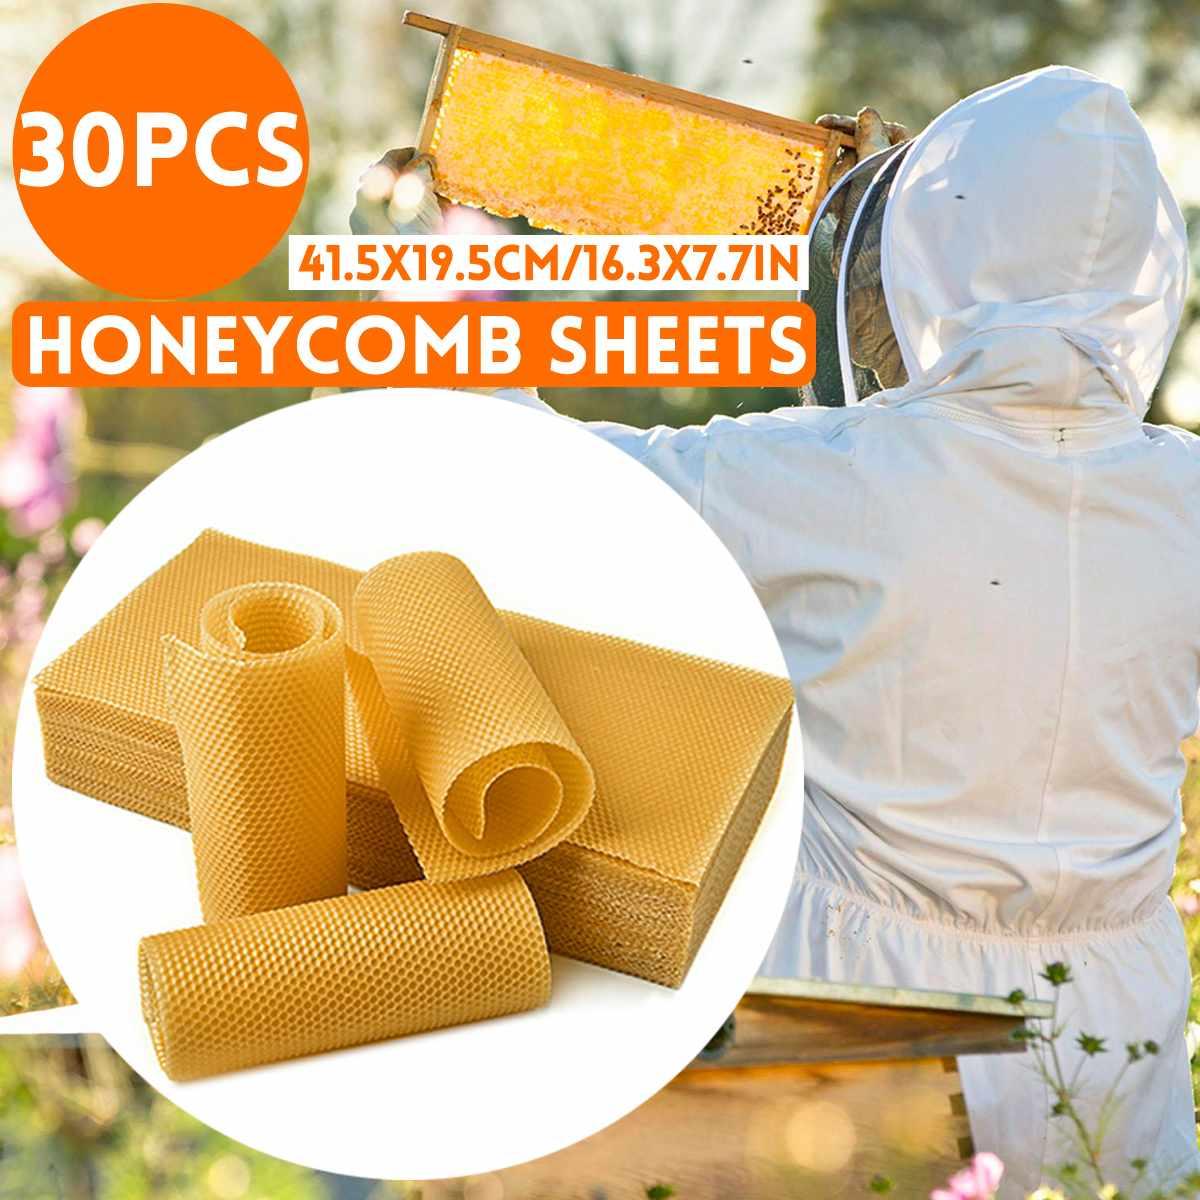 30 Uds., 415x195mm, panal, cera de abejas, Base de colmena, marcos de cera, hojas Base, peine de abeja, marco de miel, hoja de cera de abejas